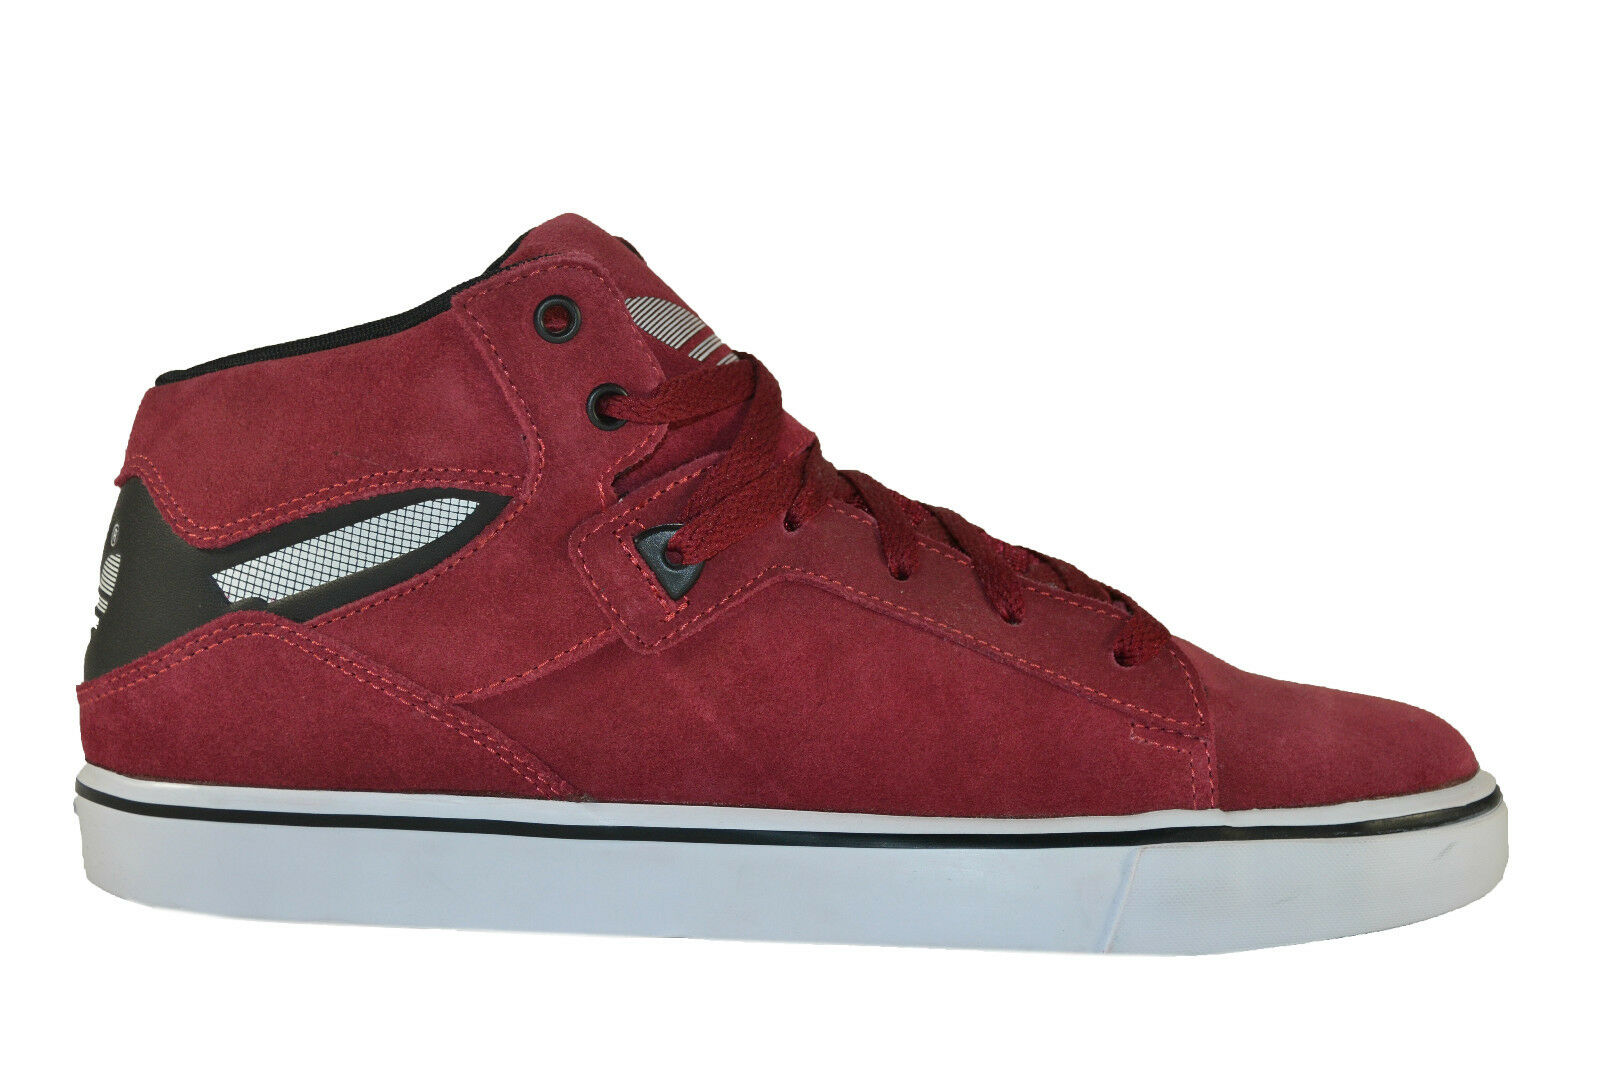 Adidas ATTITUDE VULC WEST Cardinal Red Running White Black (146) Men's Shoes